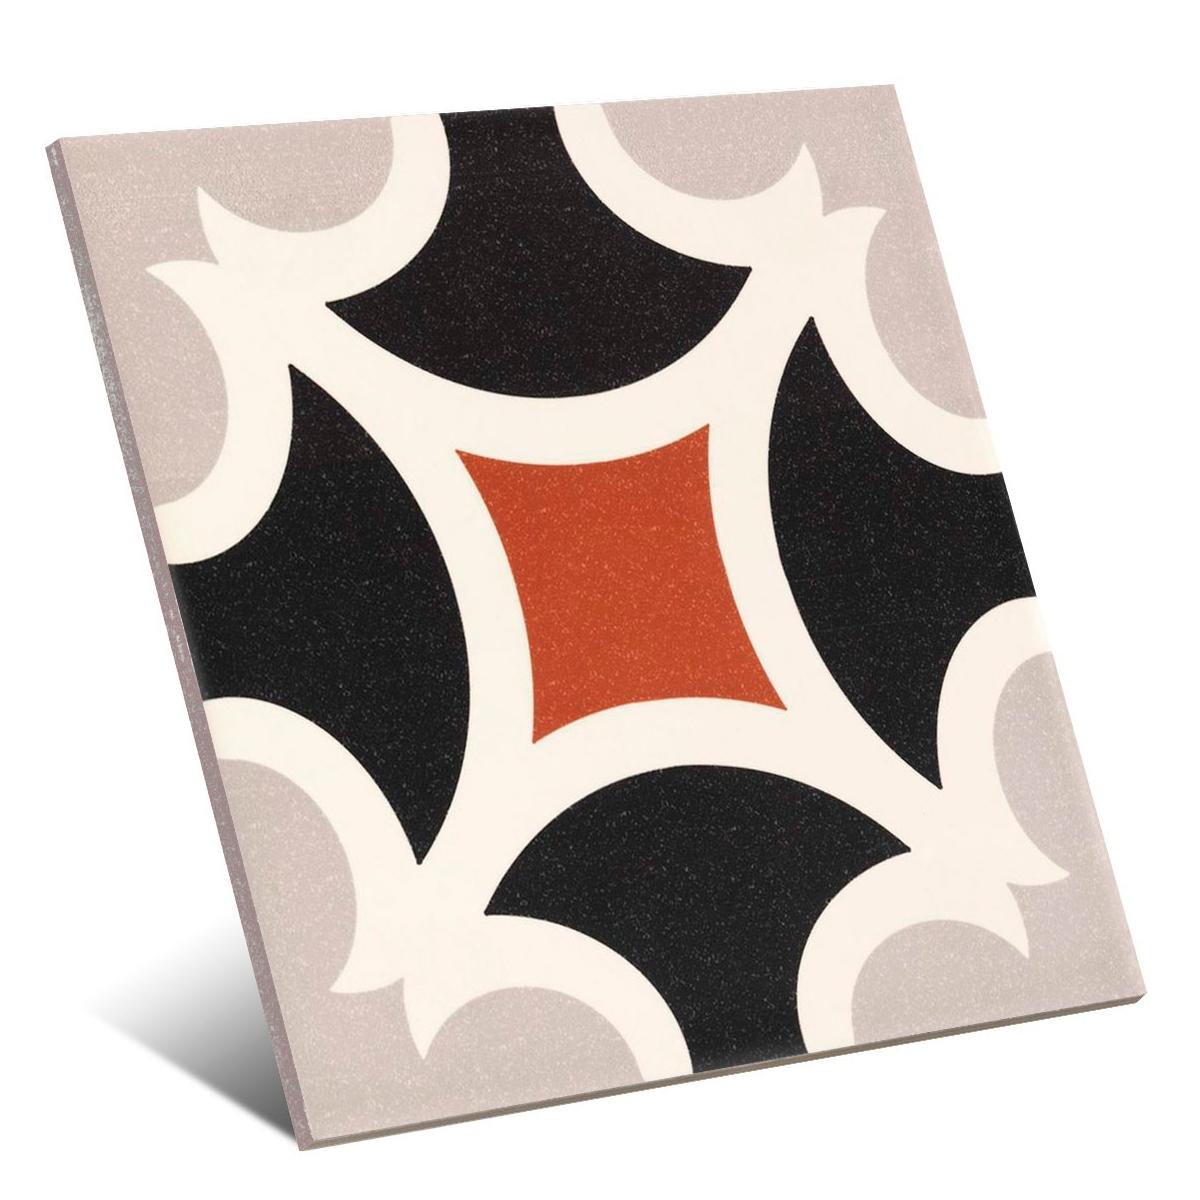 Aran gris 20x20 (caja 1 m2)